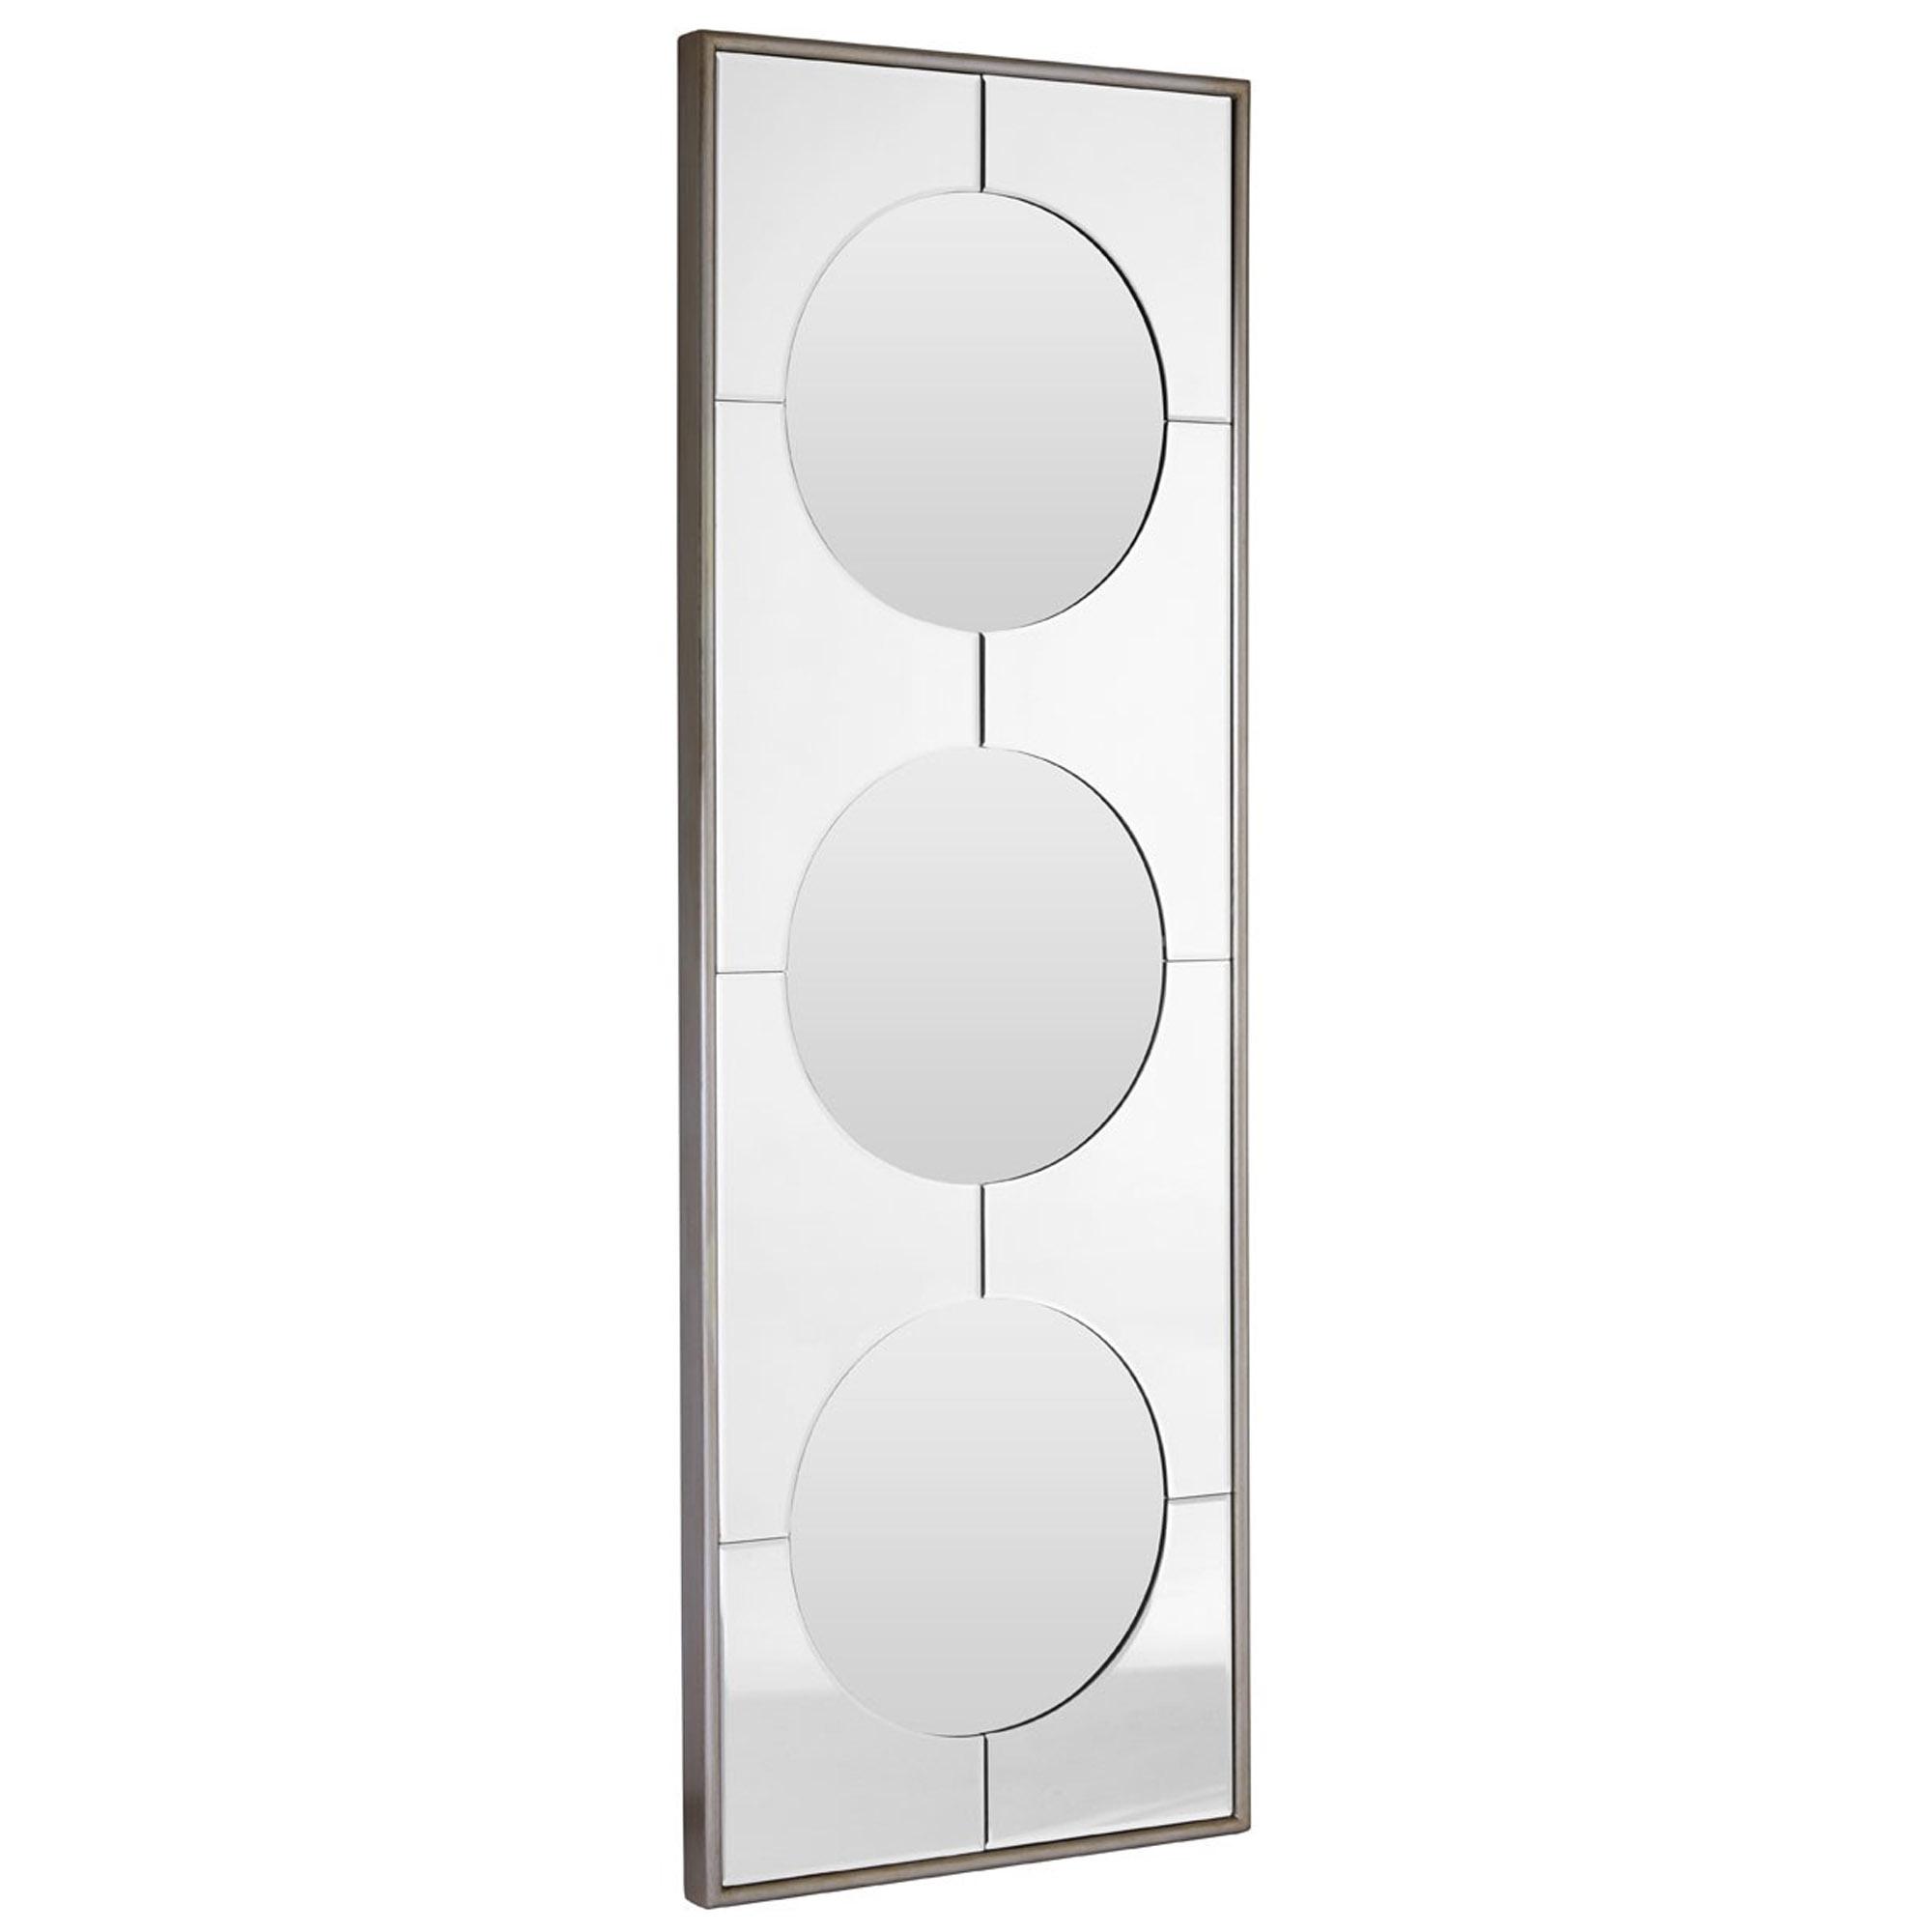 Modern Rectangular Wall Mirror With Regard To Modern Rectangle Wall Mirrors (View 14 of 20)